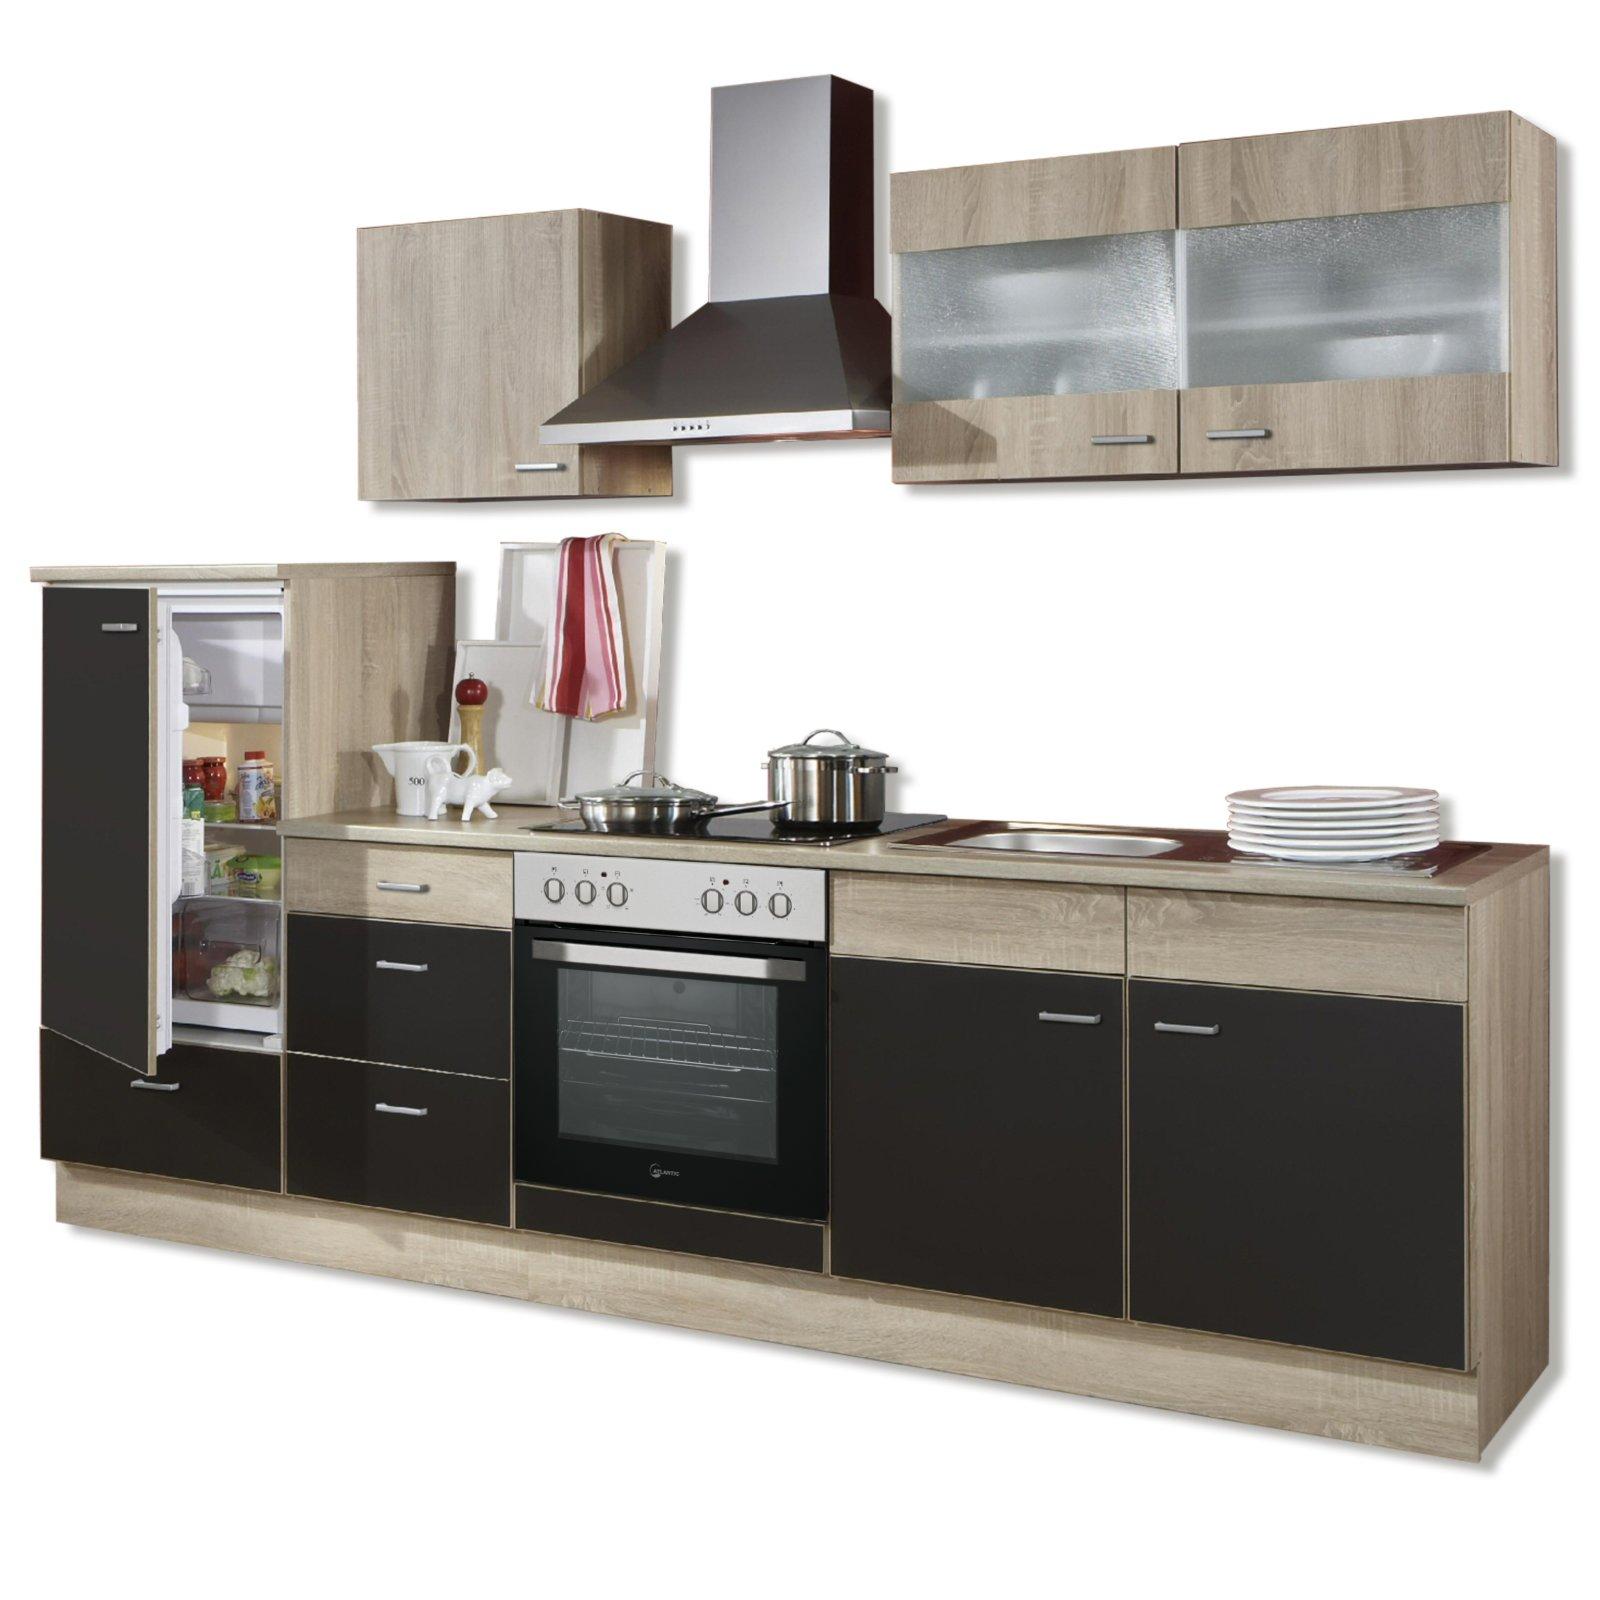 k chenblock jolina lava matt sonoma eiche mit e ger ten ebay. Black Bedroom Furniture Sets. Home Design Ideas